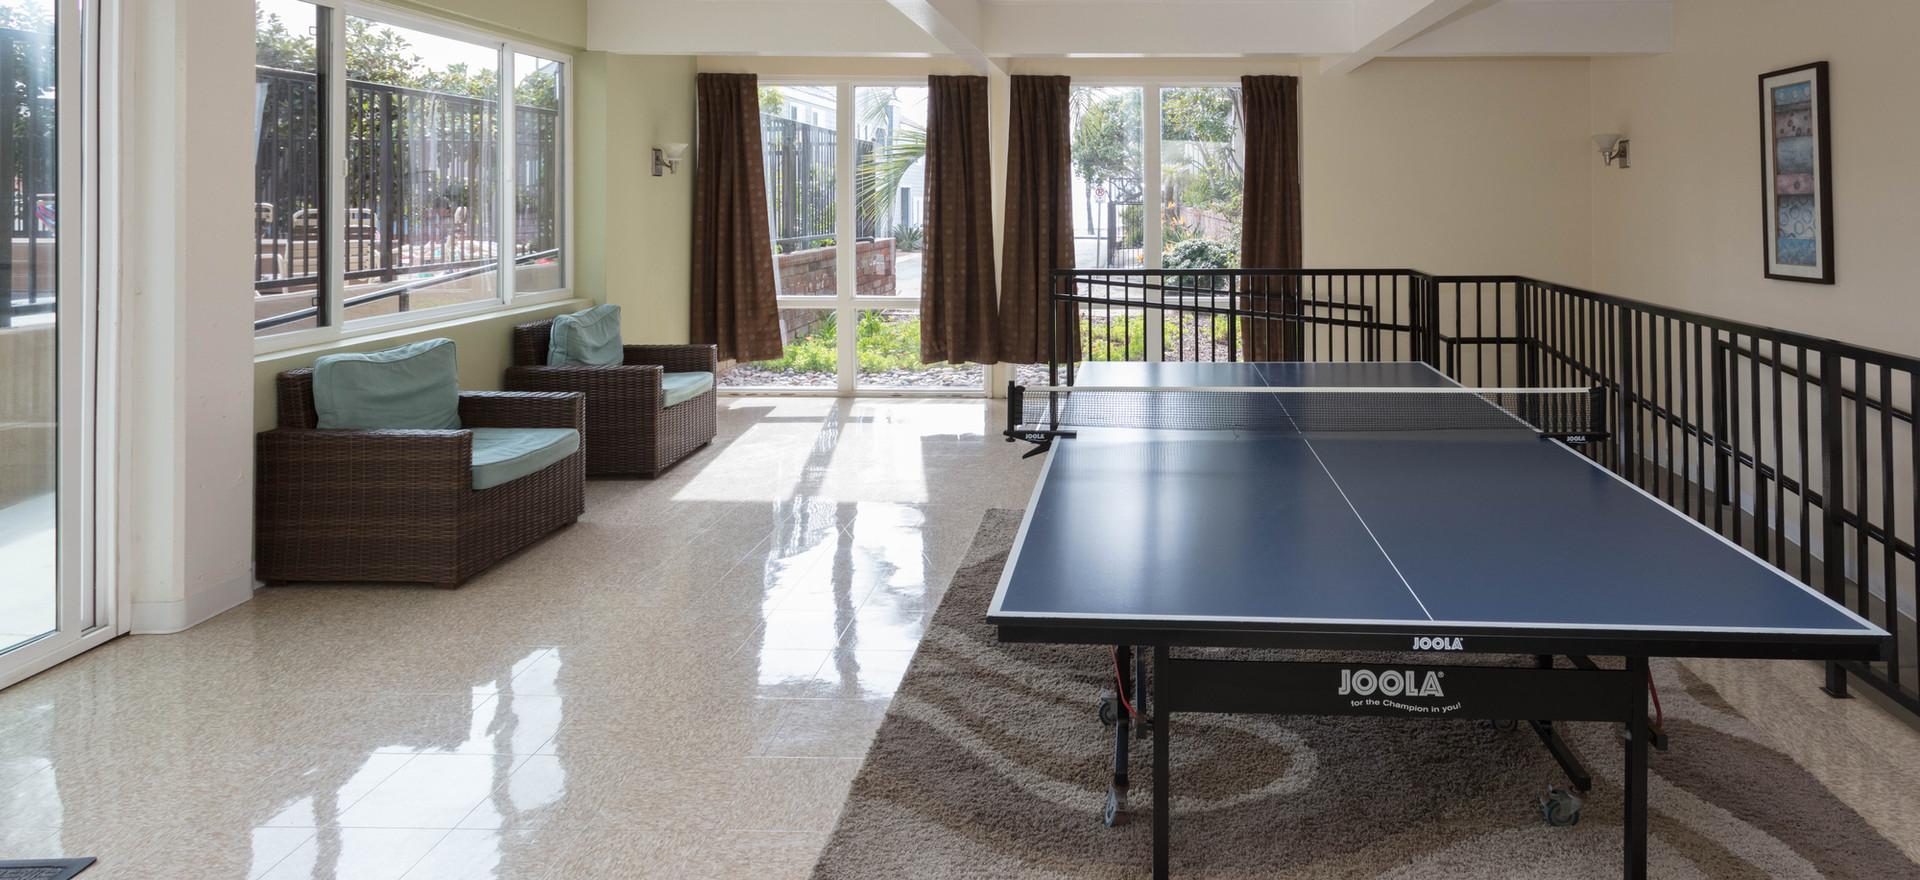 Bldg A Ping Pong Room